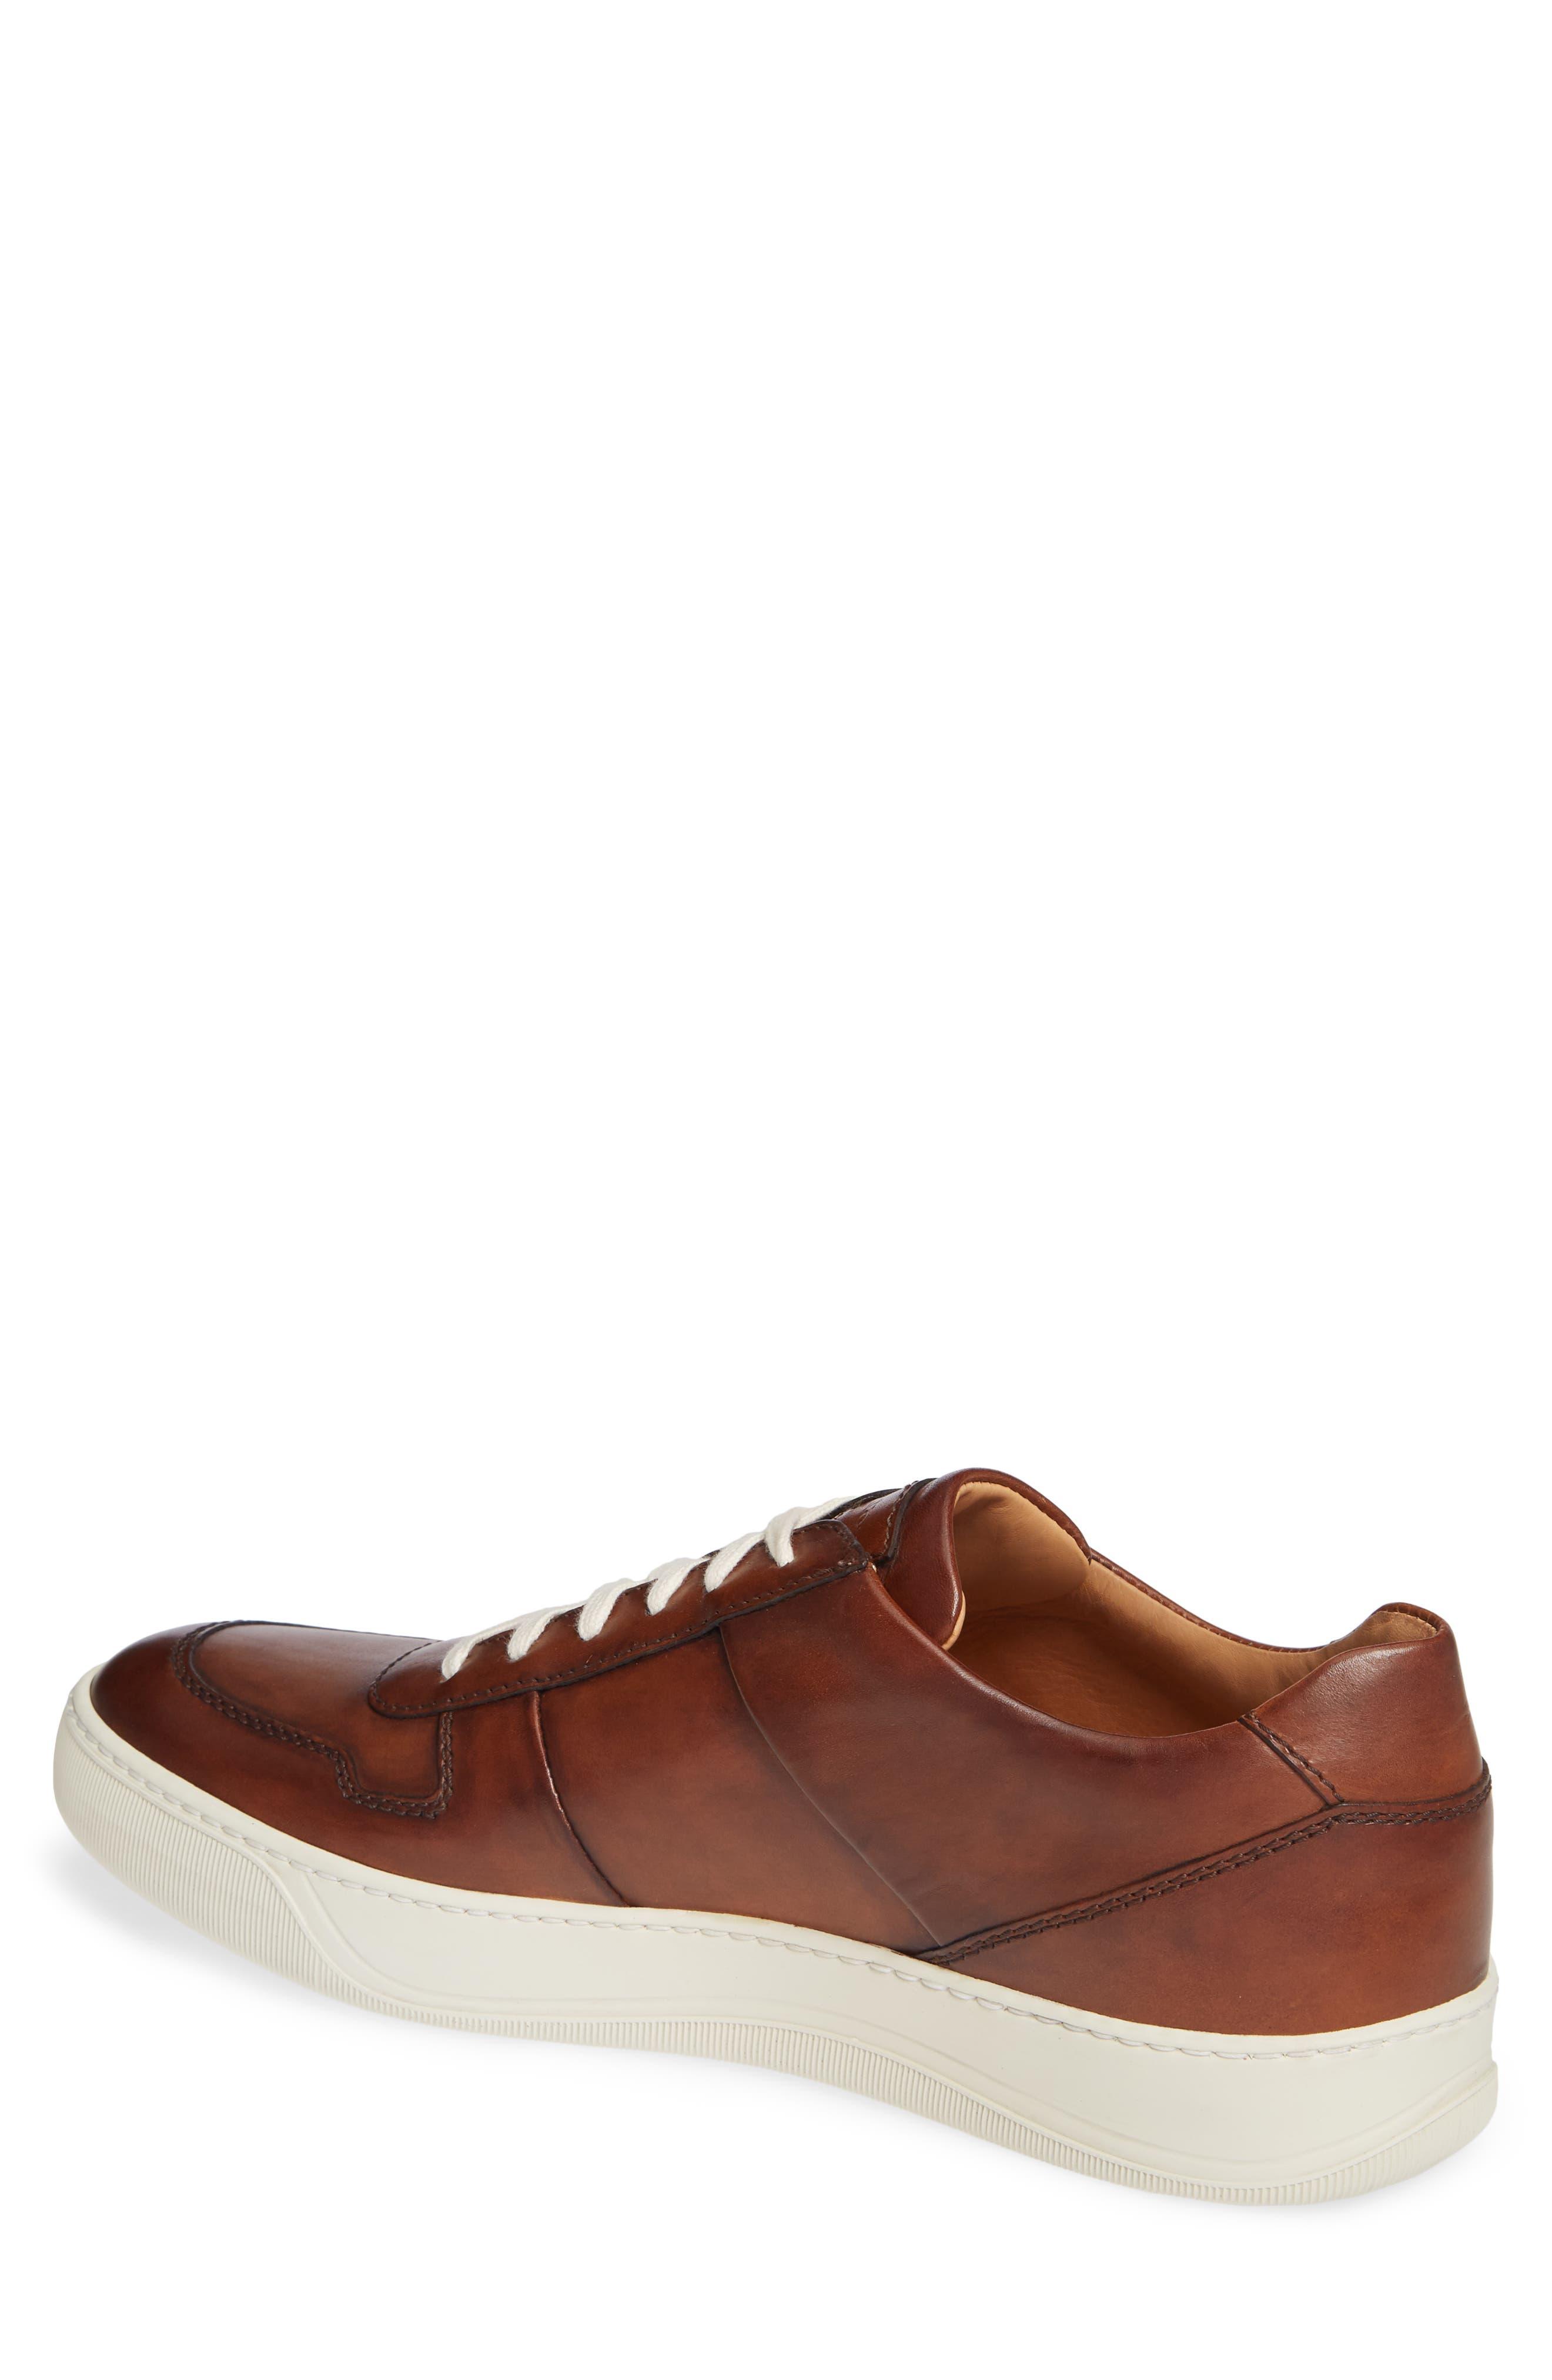 Birch Sneaker,                             Alternate thumbnail 2, color,                             BROWN